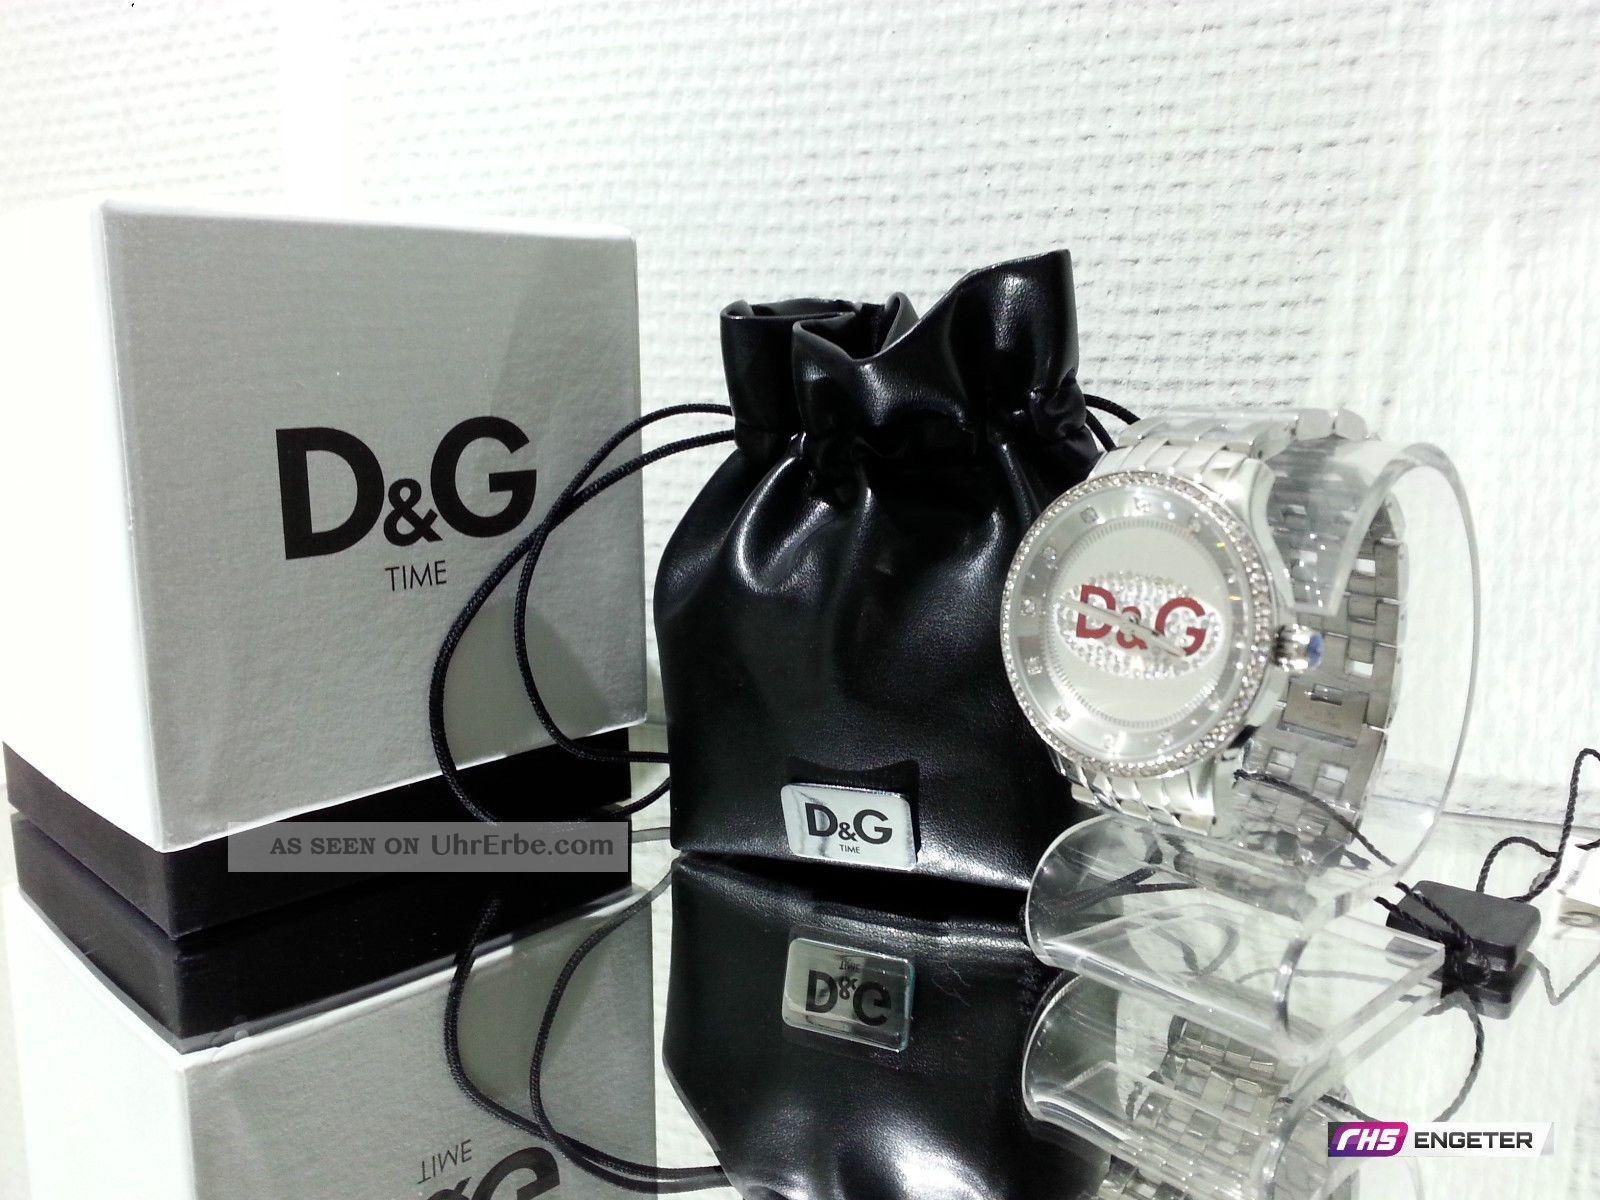 D&g Dolce Gabbana Damen Uhr Silber Edelstahl Armbanduhr Prime Time Watch Dw0144 Armbanduhren Bild